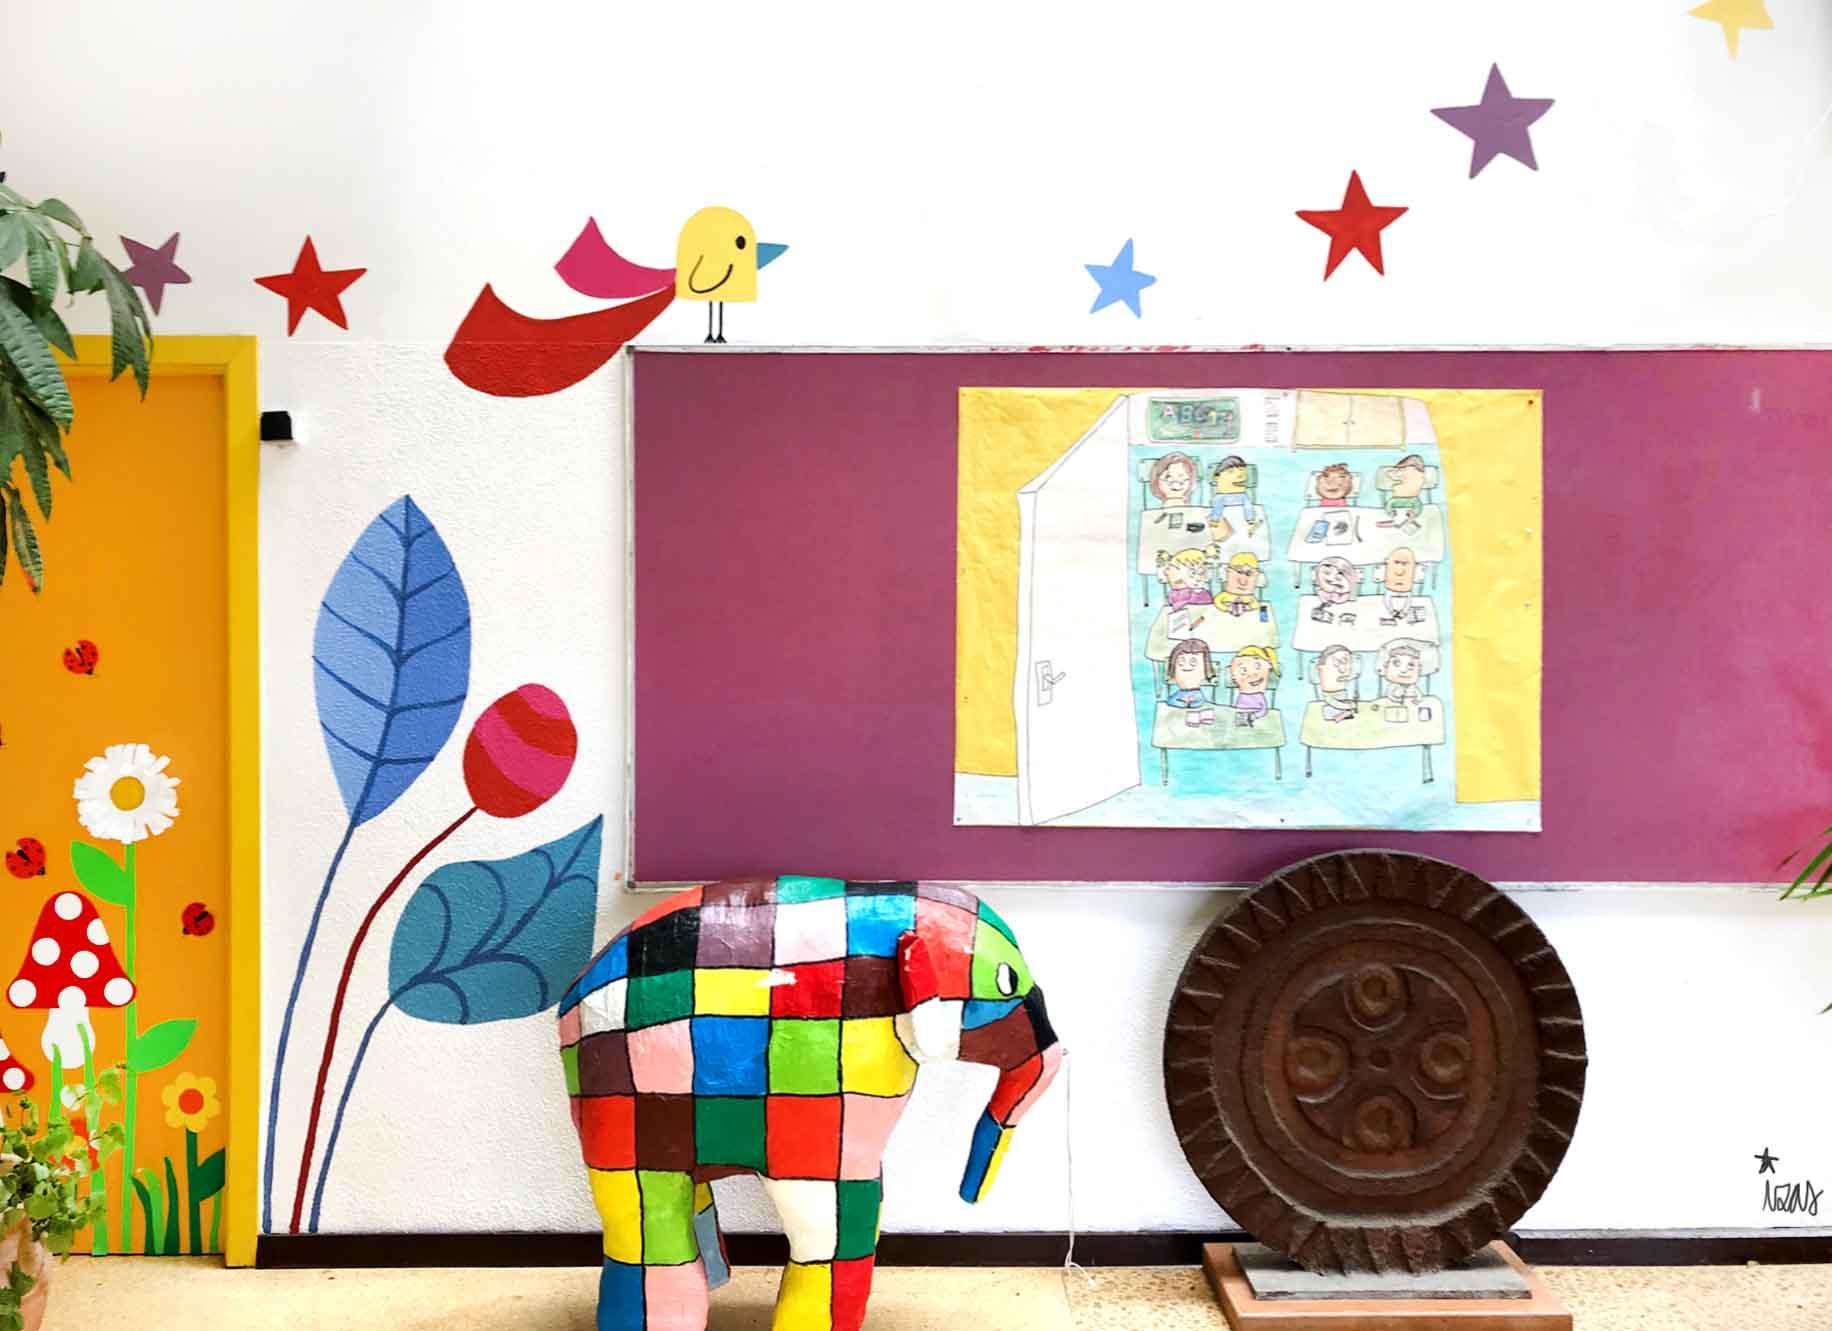 mural izas gerardo diego interior 4